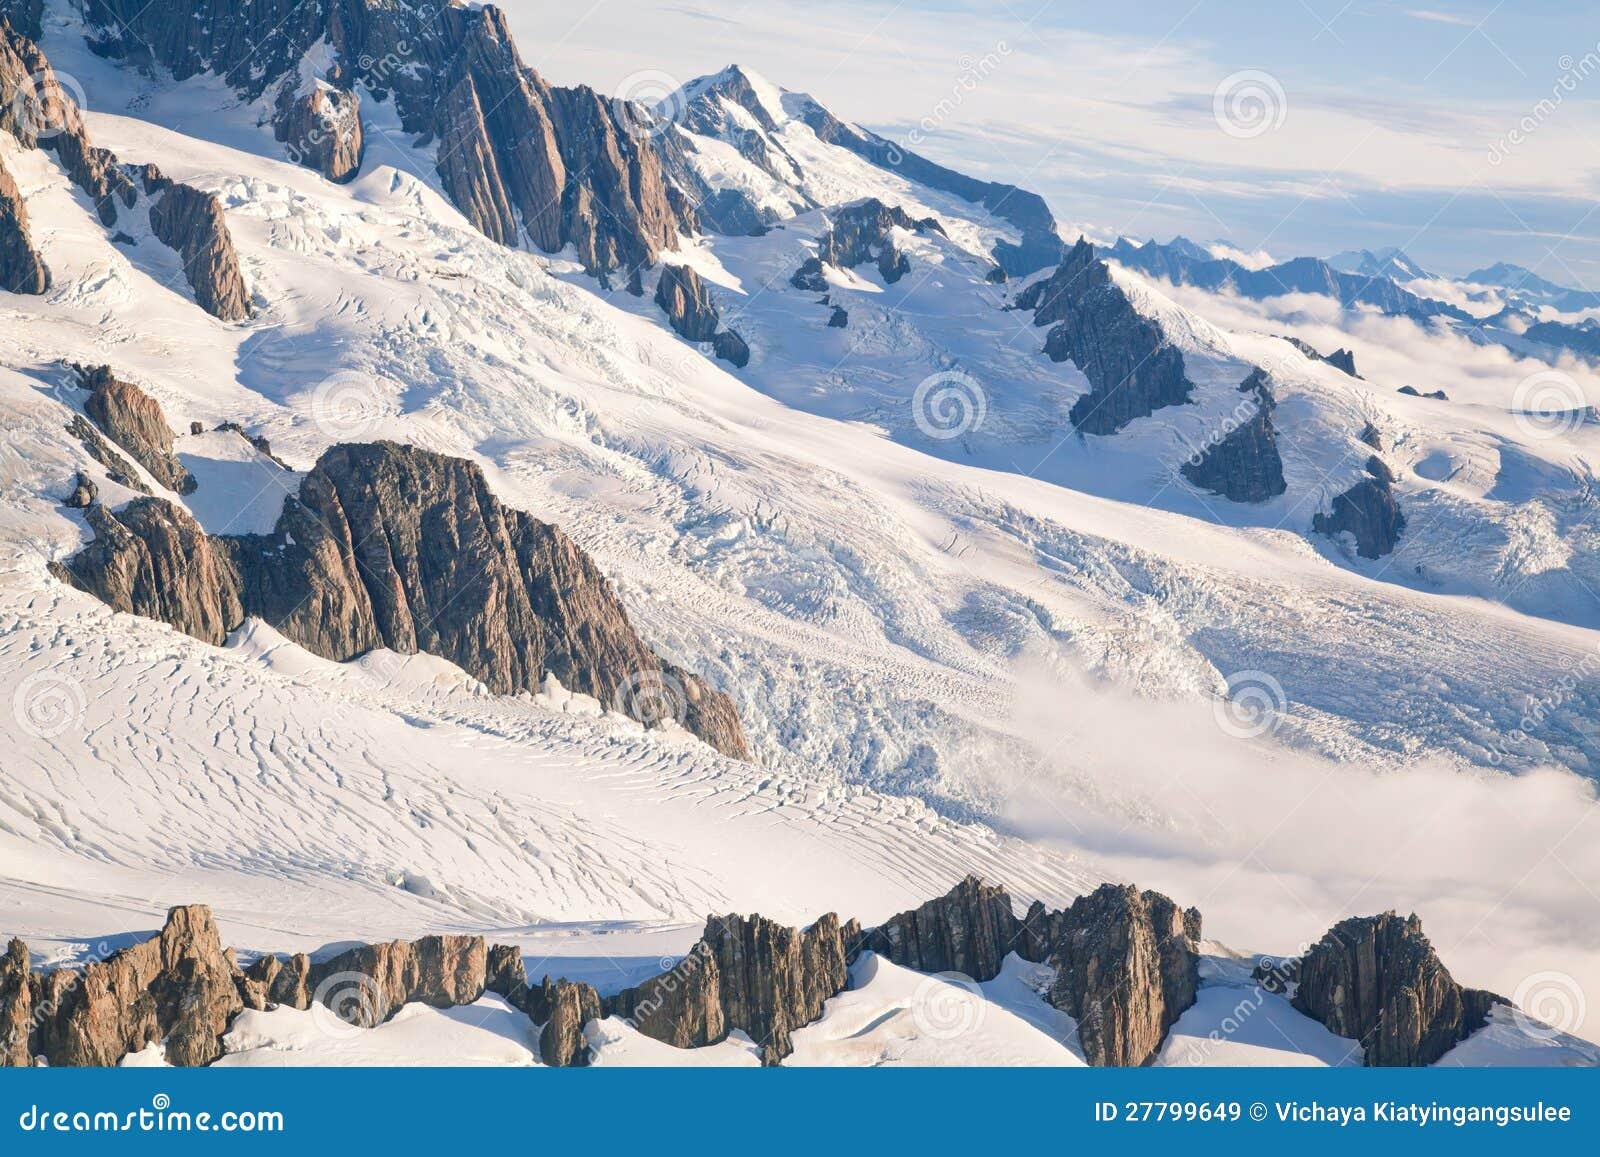 New Zealand Time Image: Winter Landscape New Zealand Royalty Free Stock Images